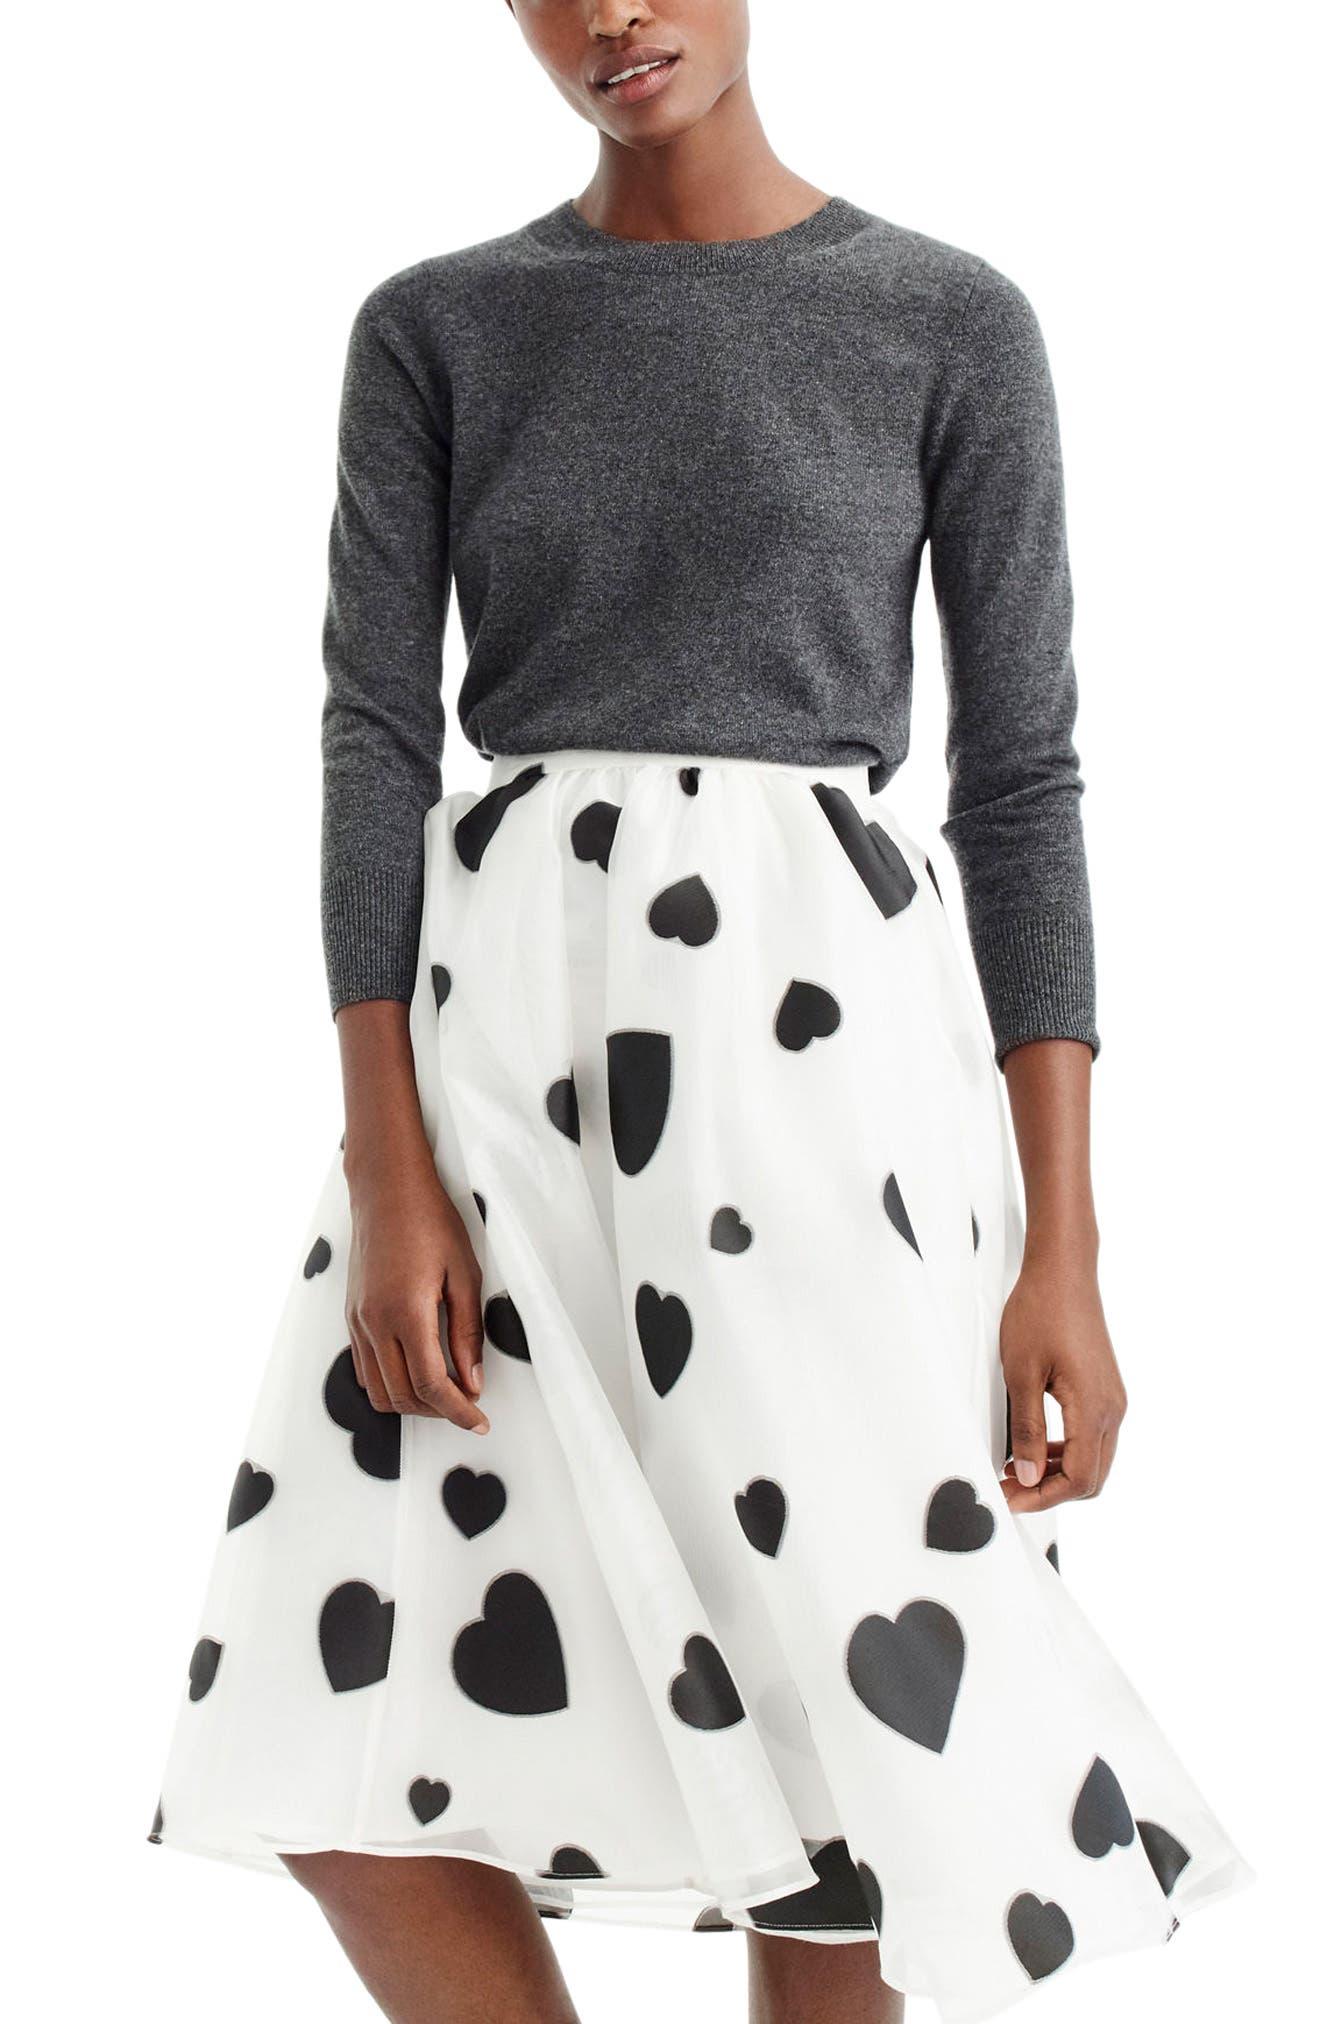 J.Crew Heart Print Organza Skirt